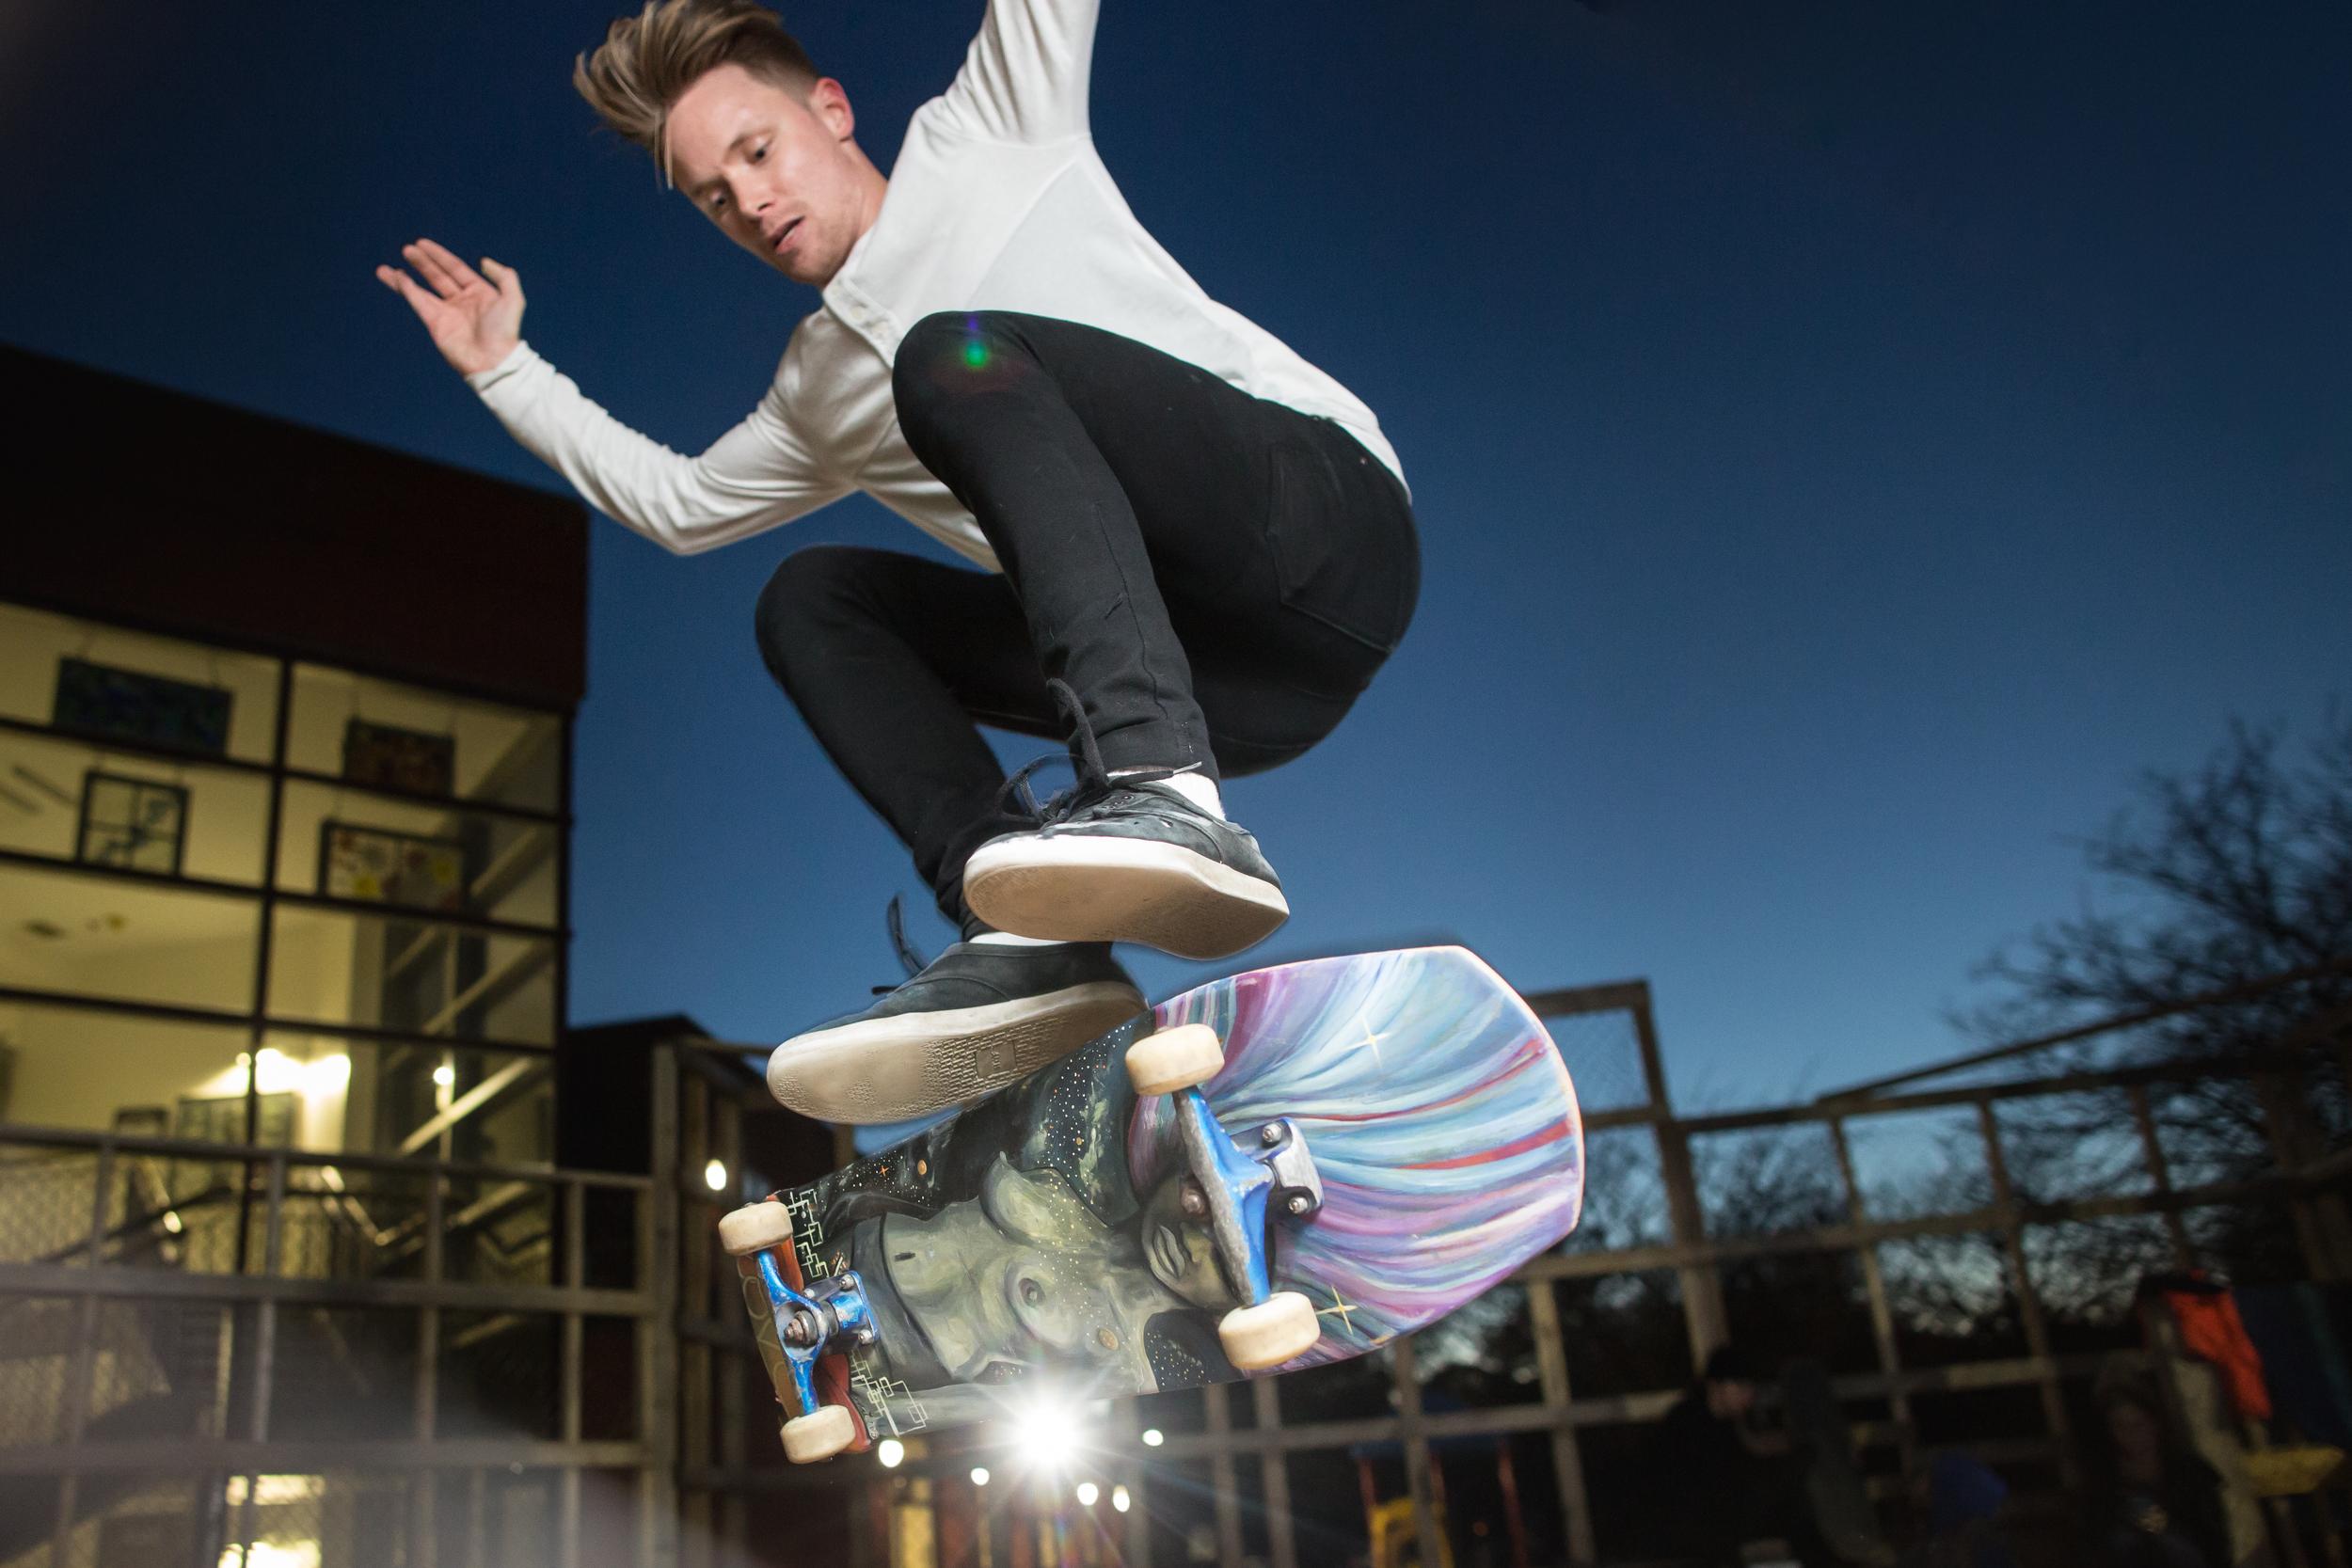 151023-183526-SkylerSkateboarding_DavidJohnsonPhotography_Mailyne Briggs_Dream Love Grow Art-0203.jpg